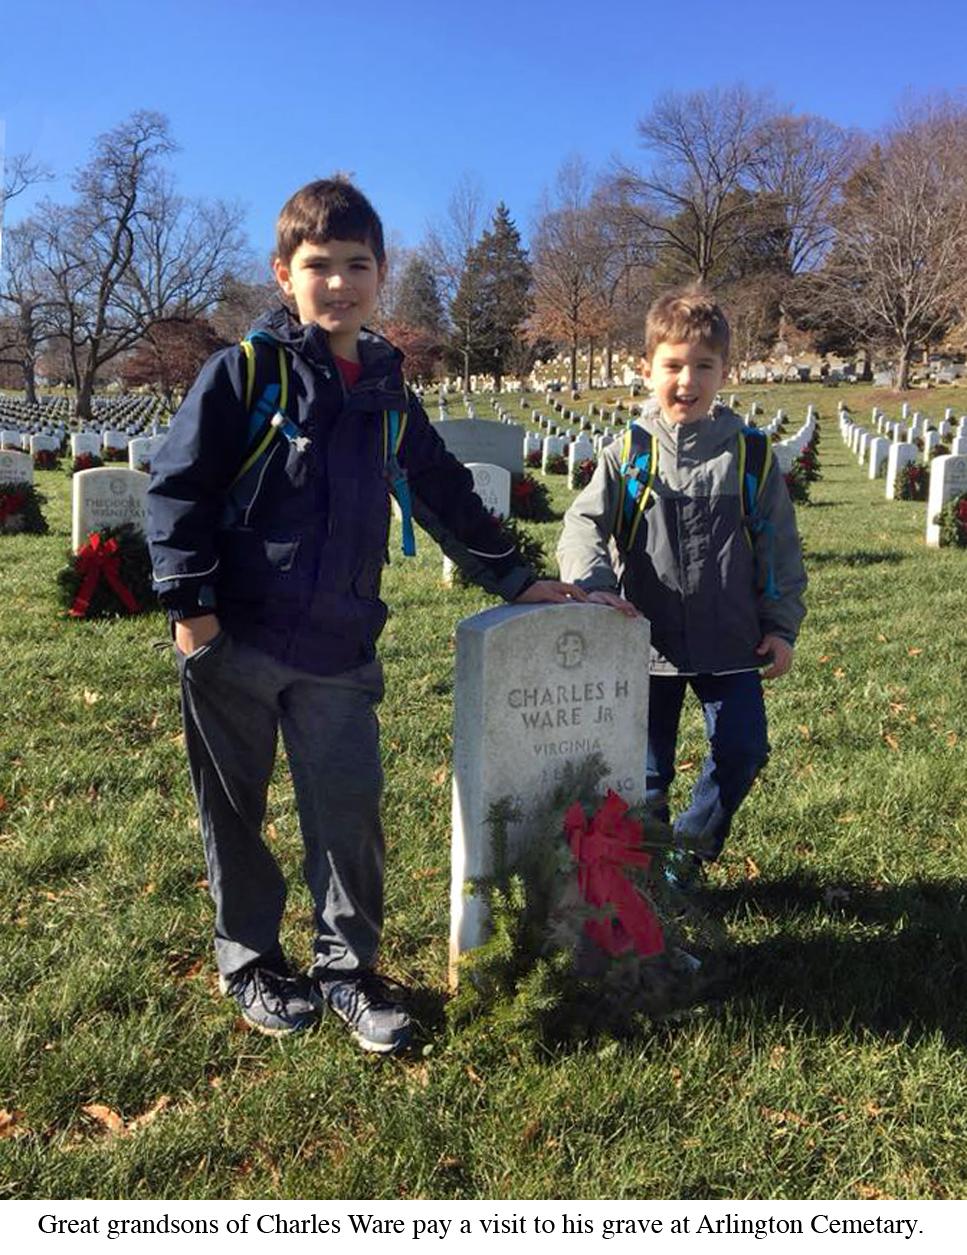 2nd Lt. Charles Henry Ware Jr. great grandkids